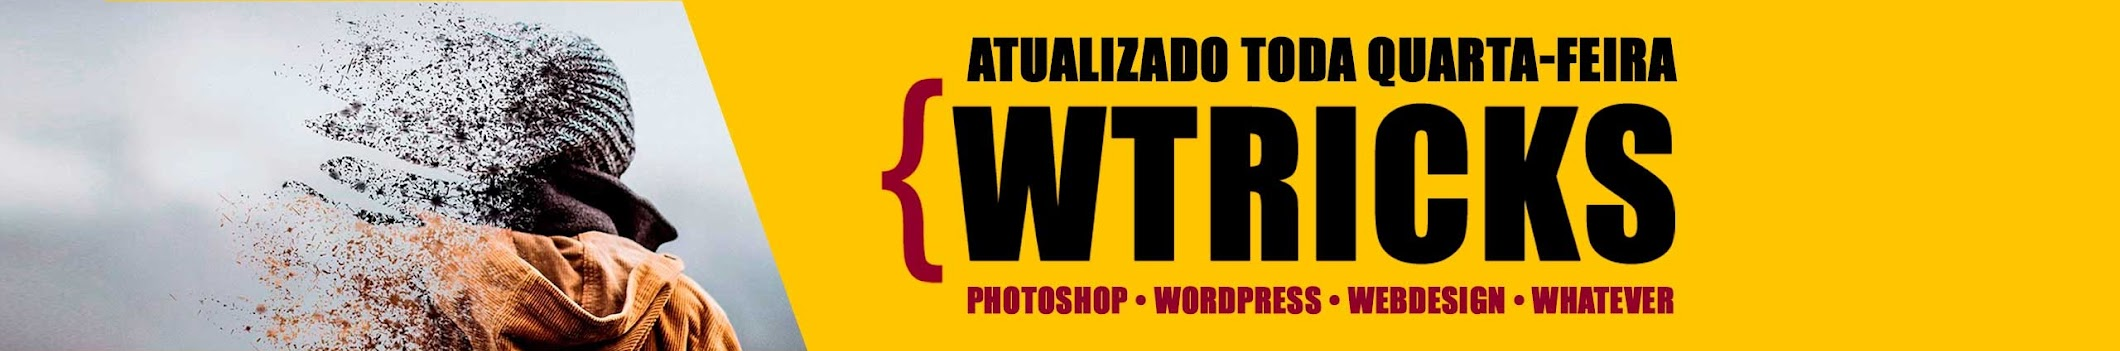 WTRICKS Tutoriais